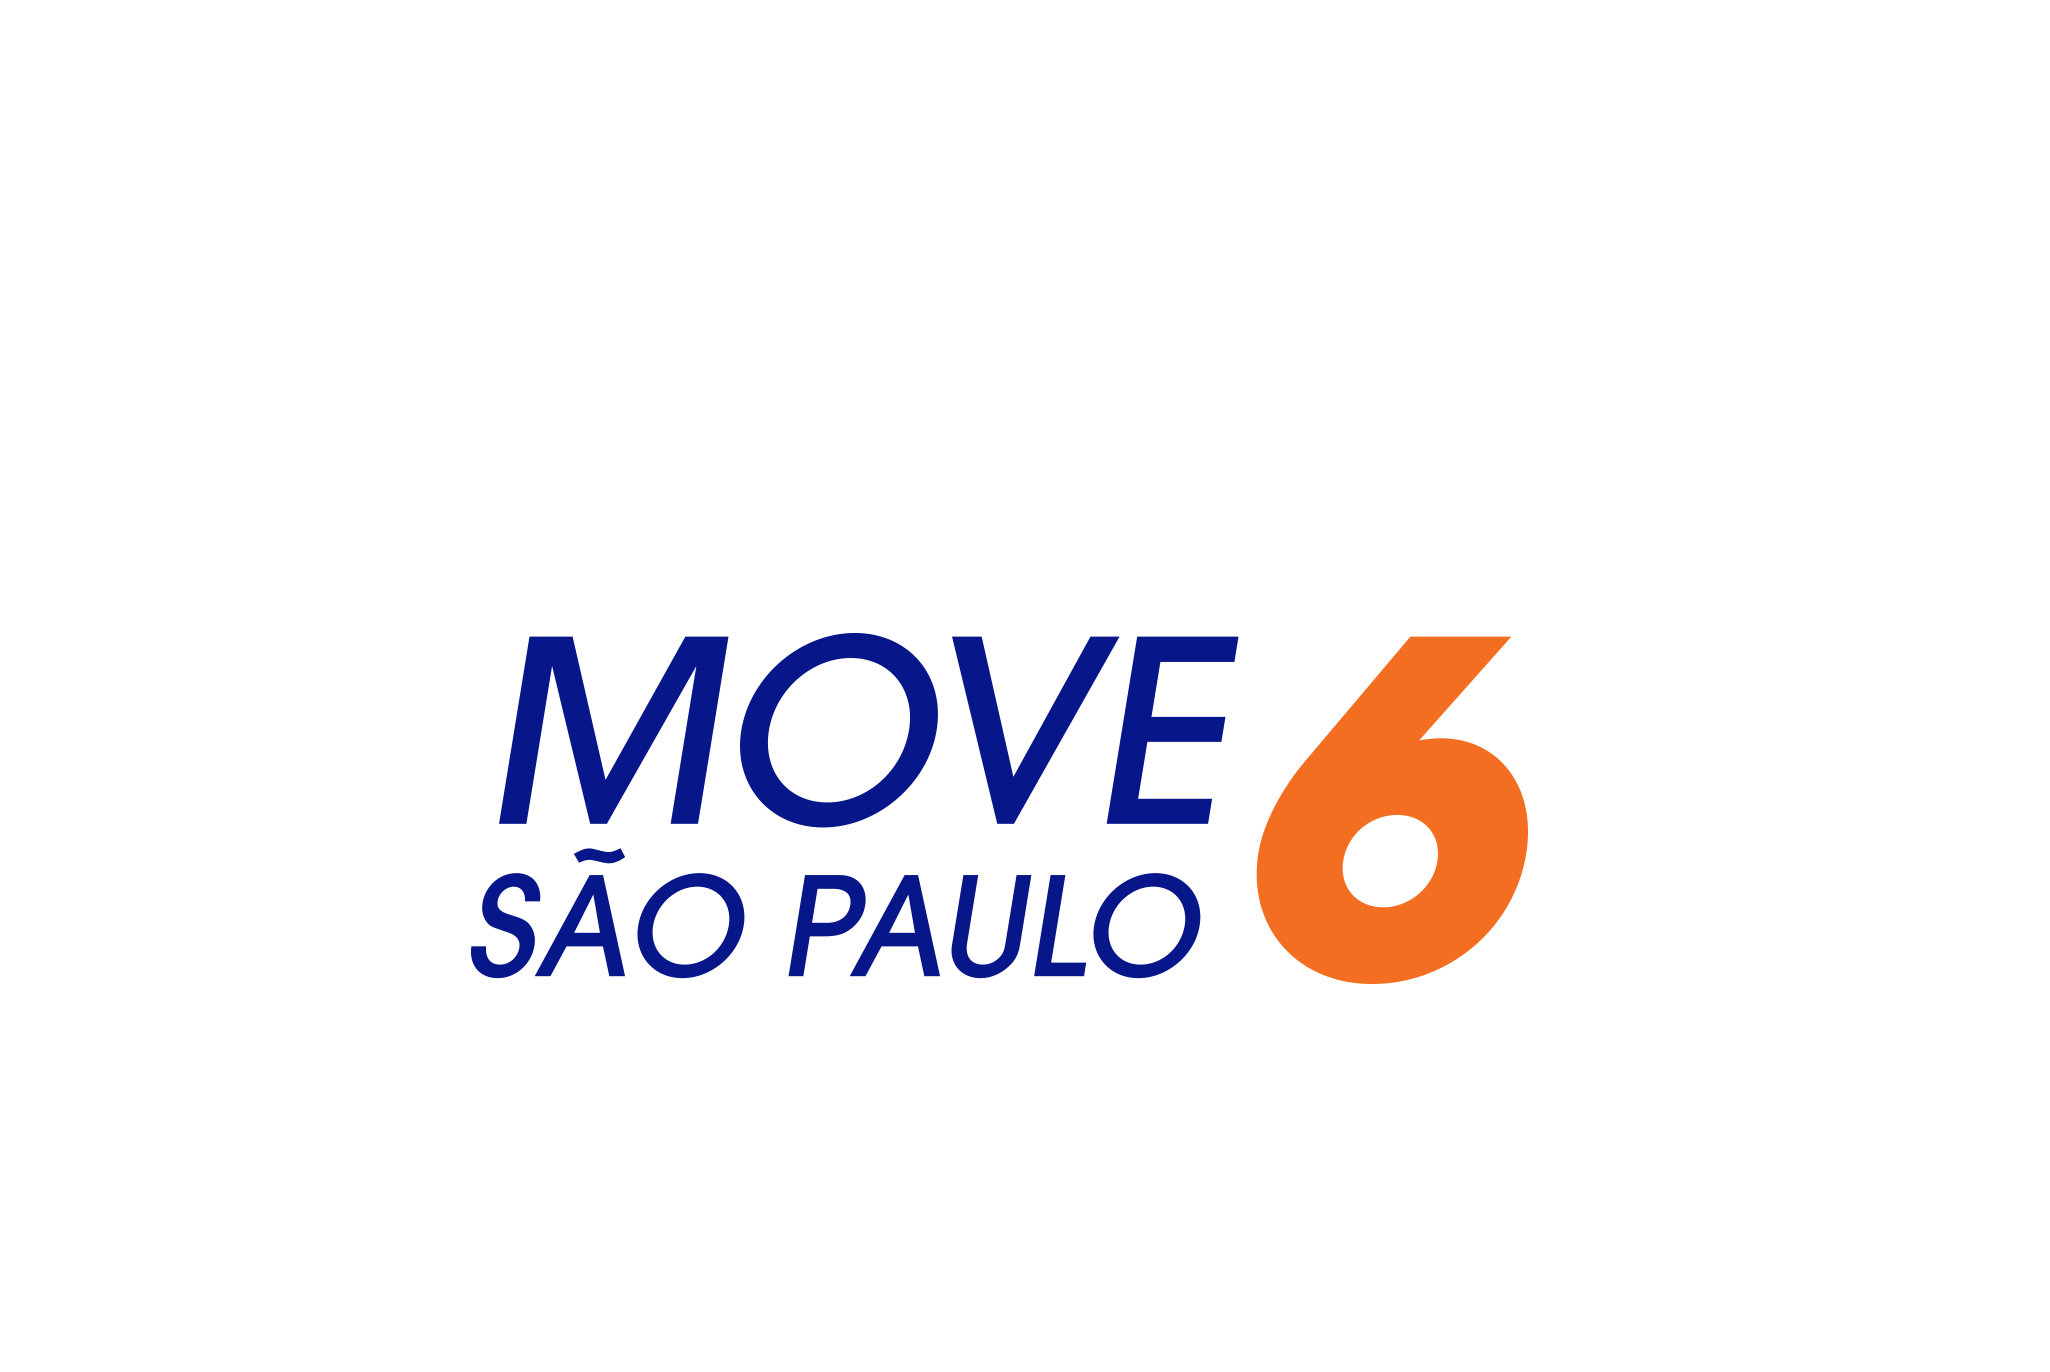 portfolio_marcas_move6